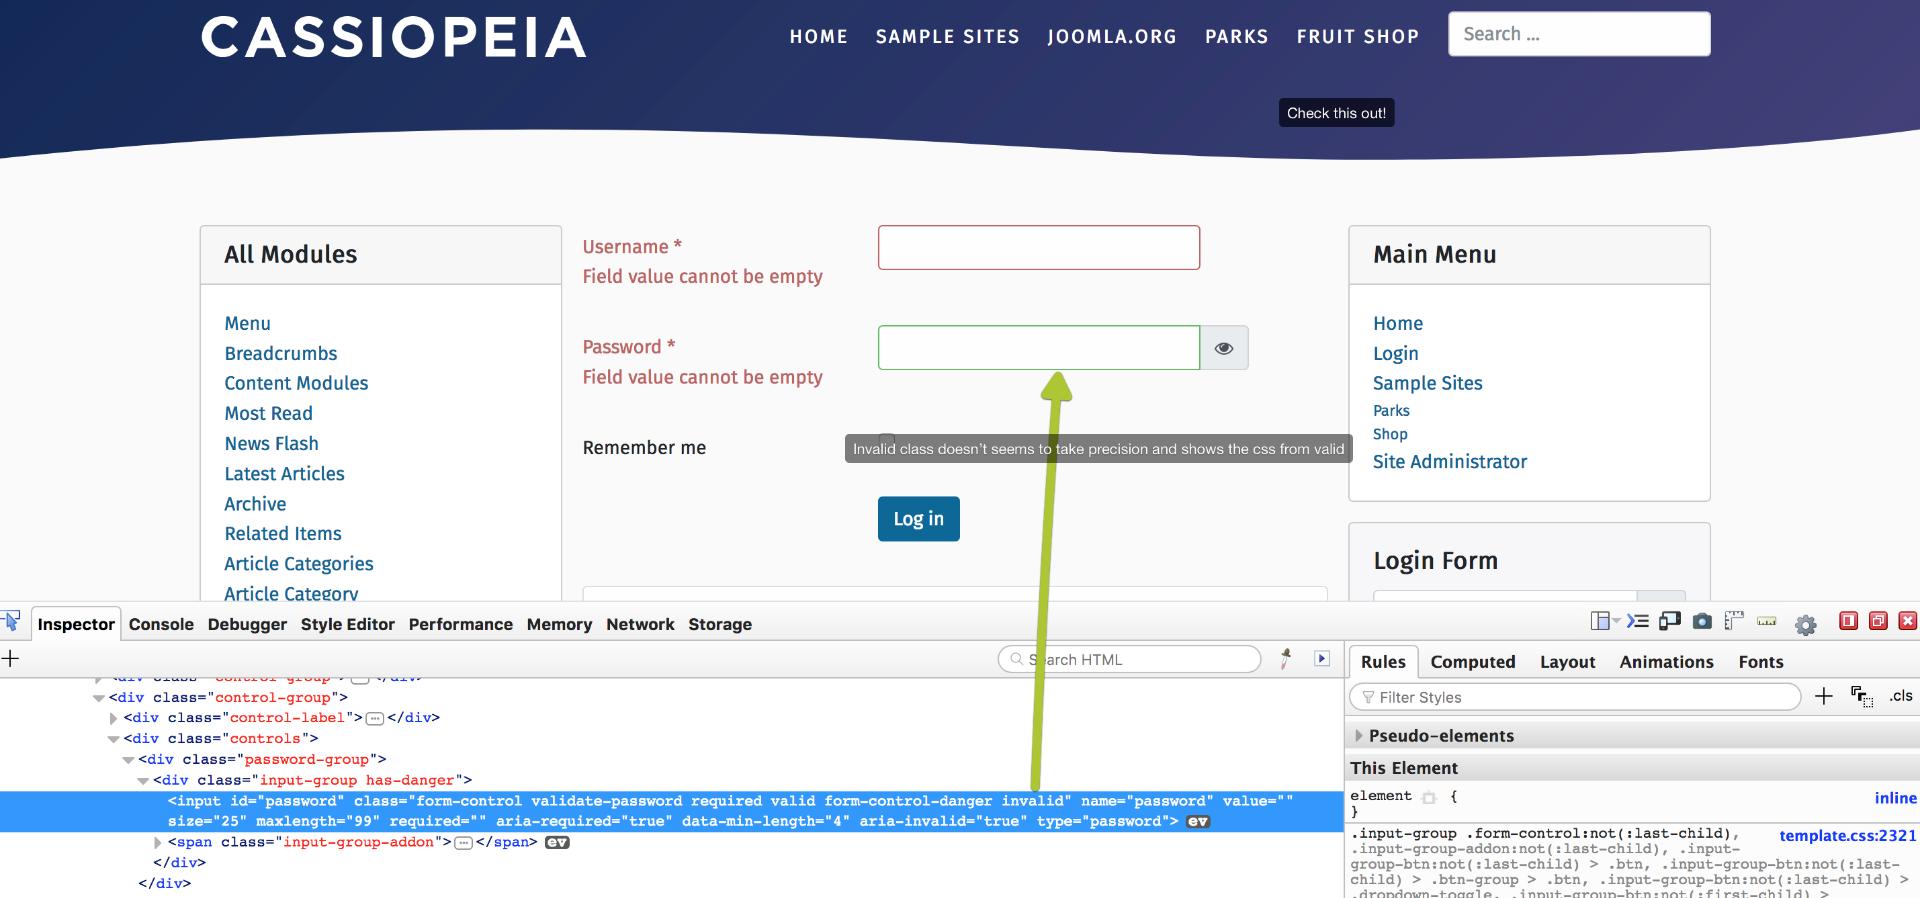 Joomla! Issue Tracker | Joomla! CMS #18634 - [4 0] Invalid